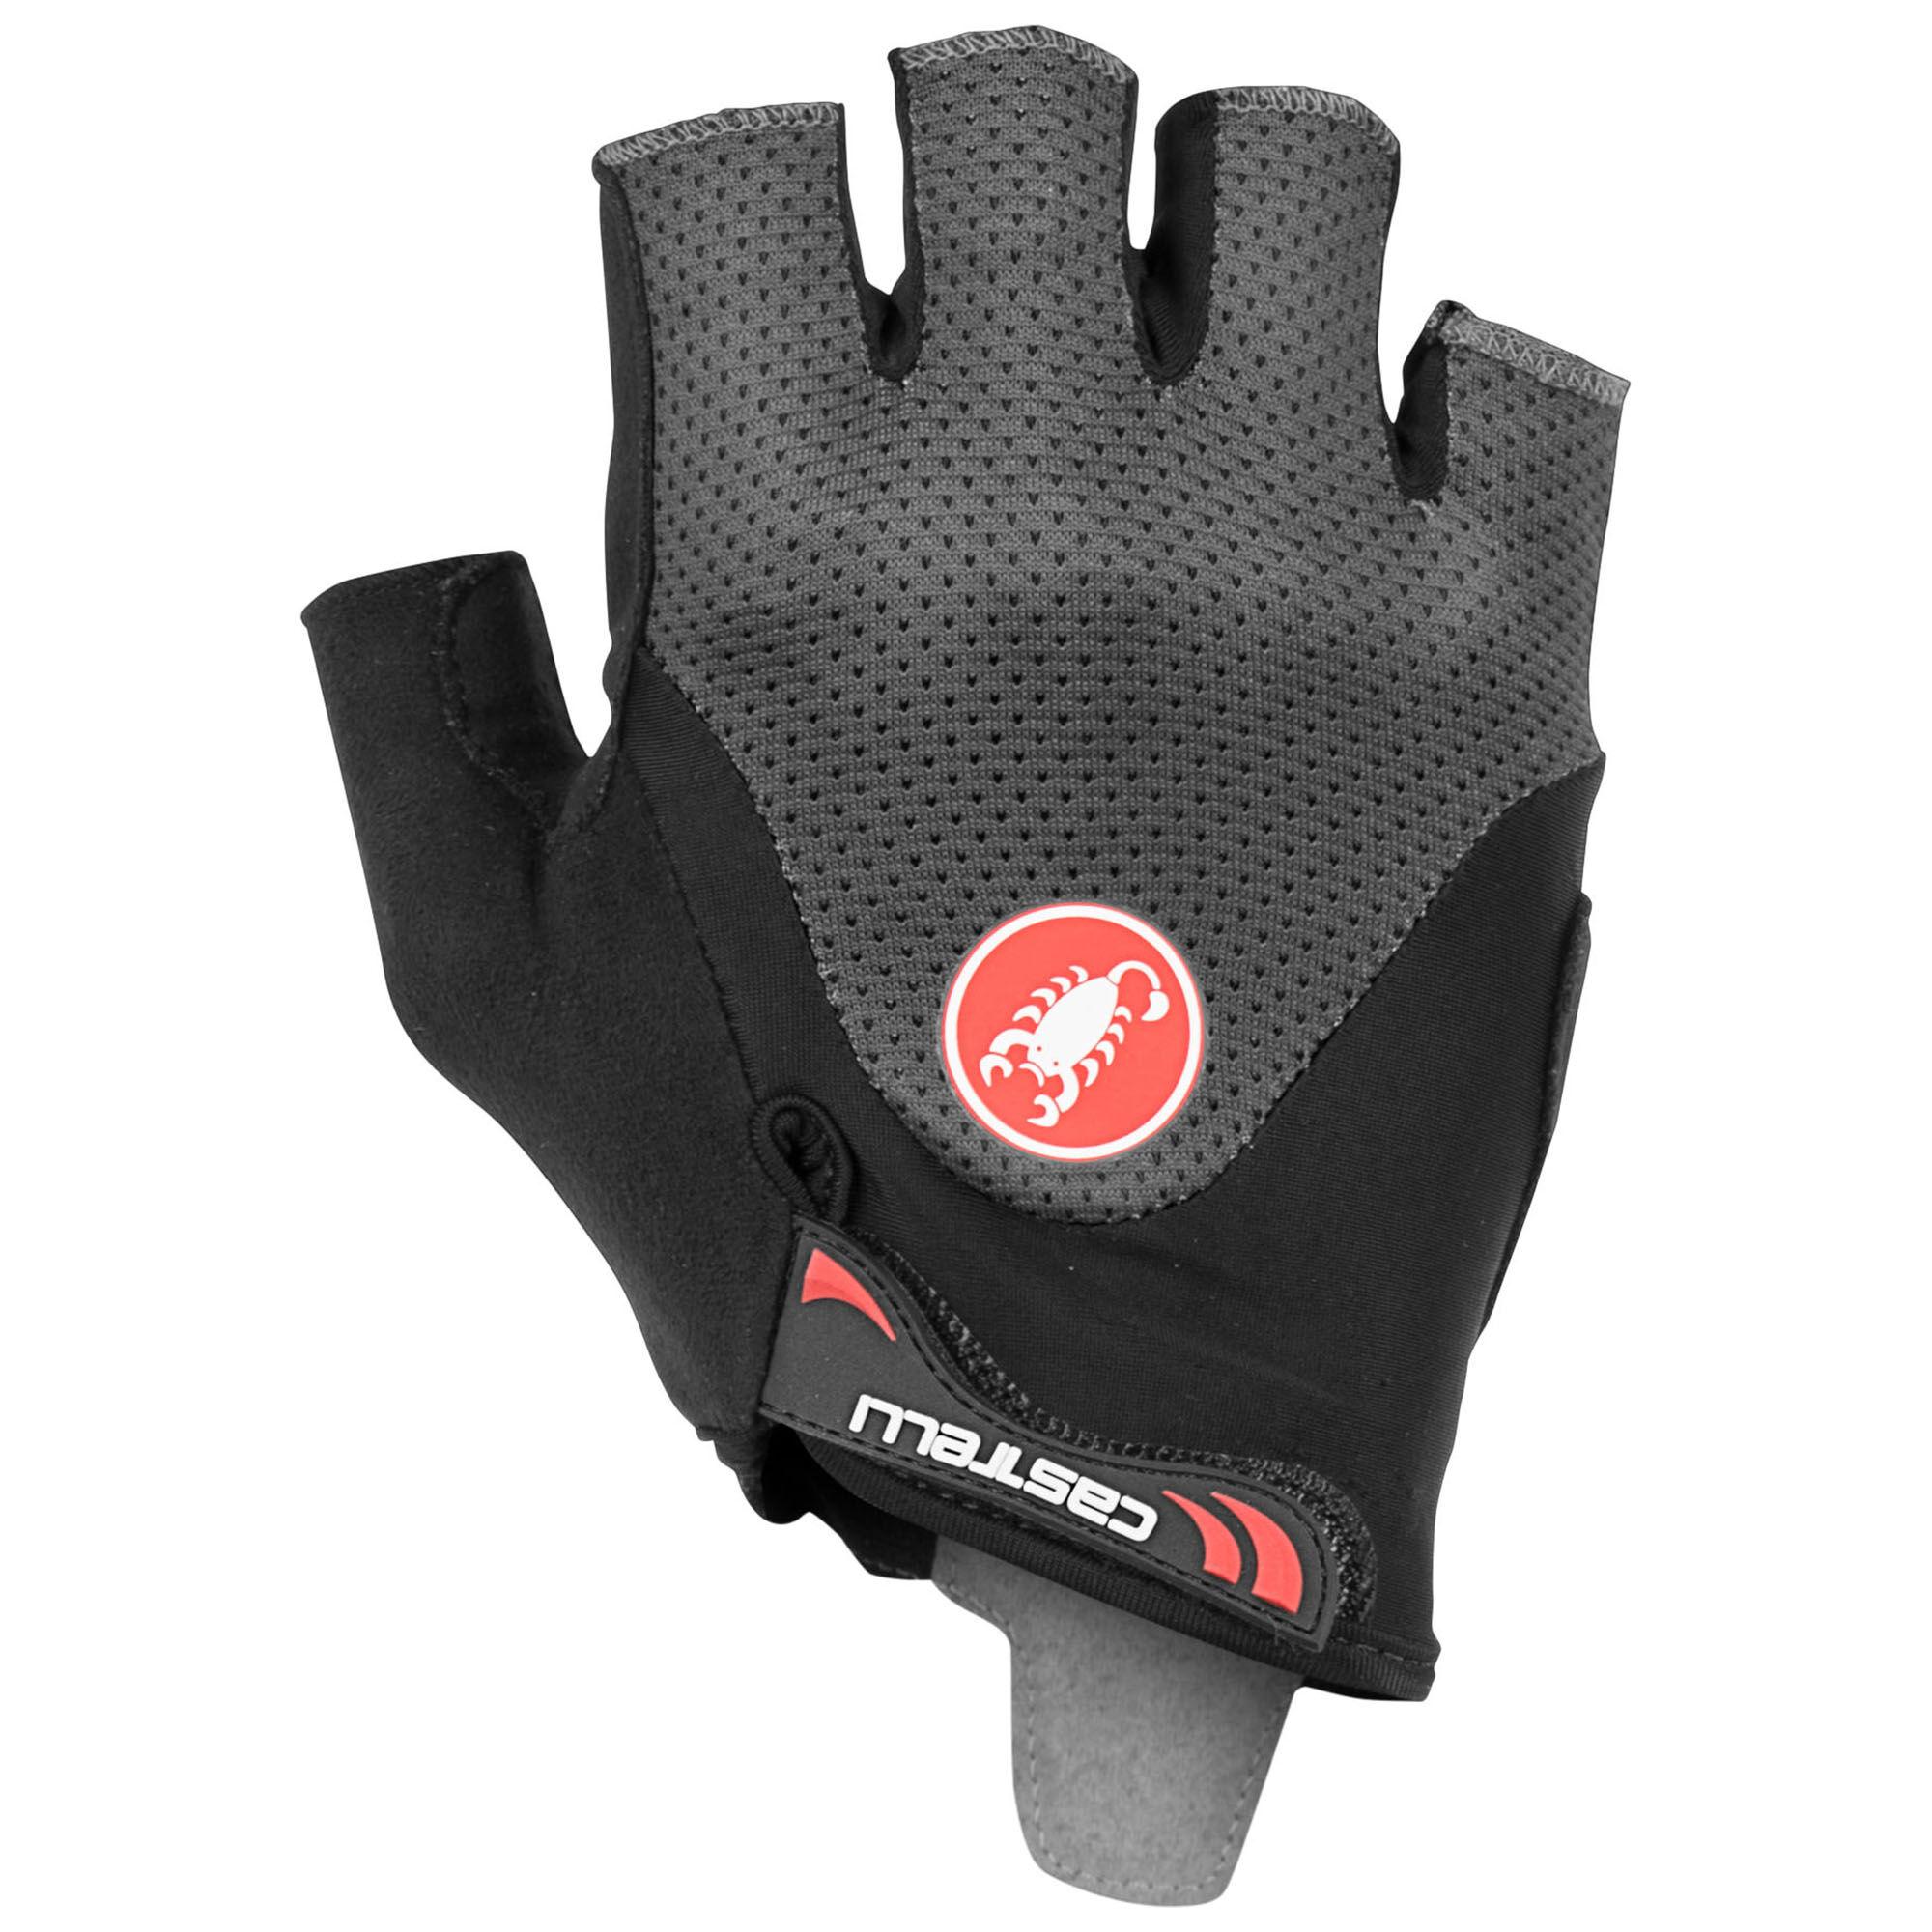 Castelli Men's Arenberg Gel 2 Bike Gloves  - Black/Ivory - Size: Medium